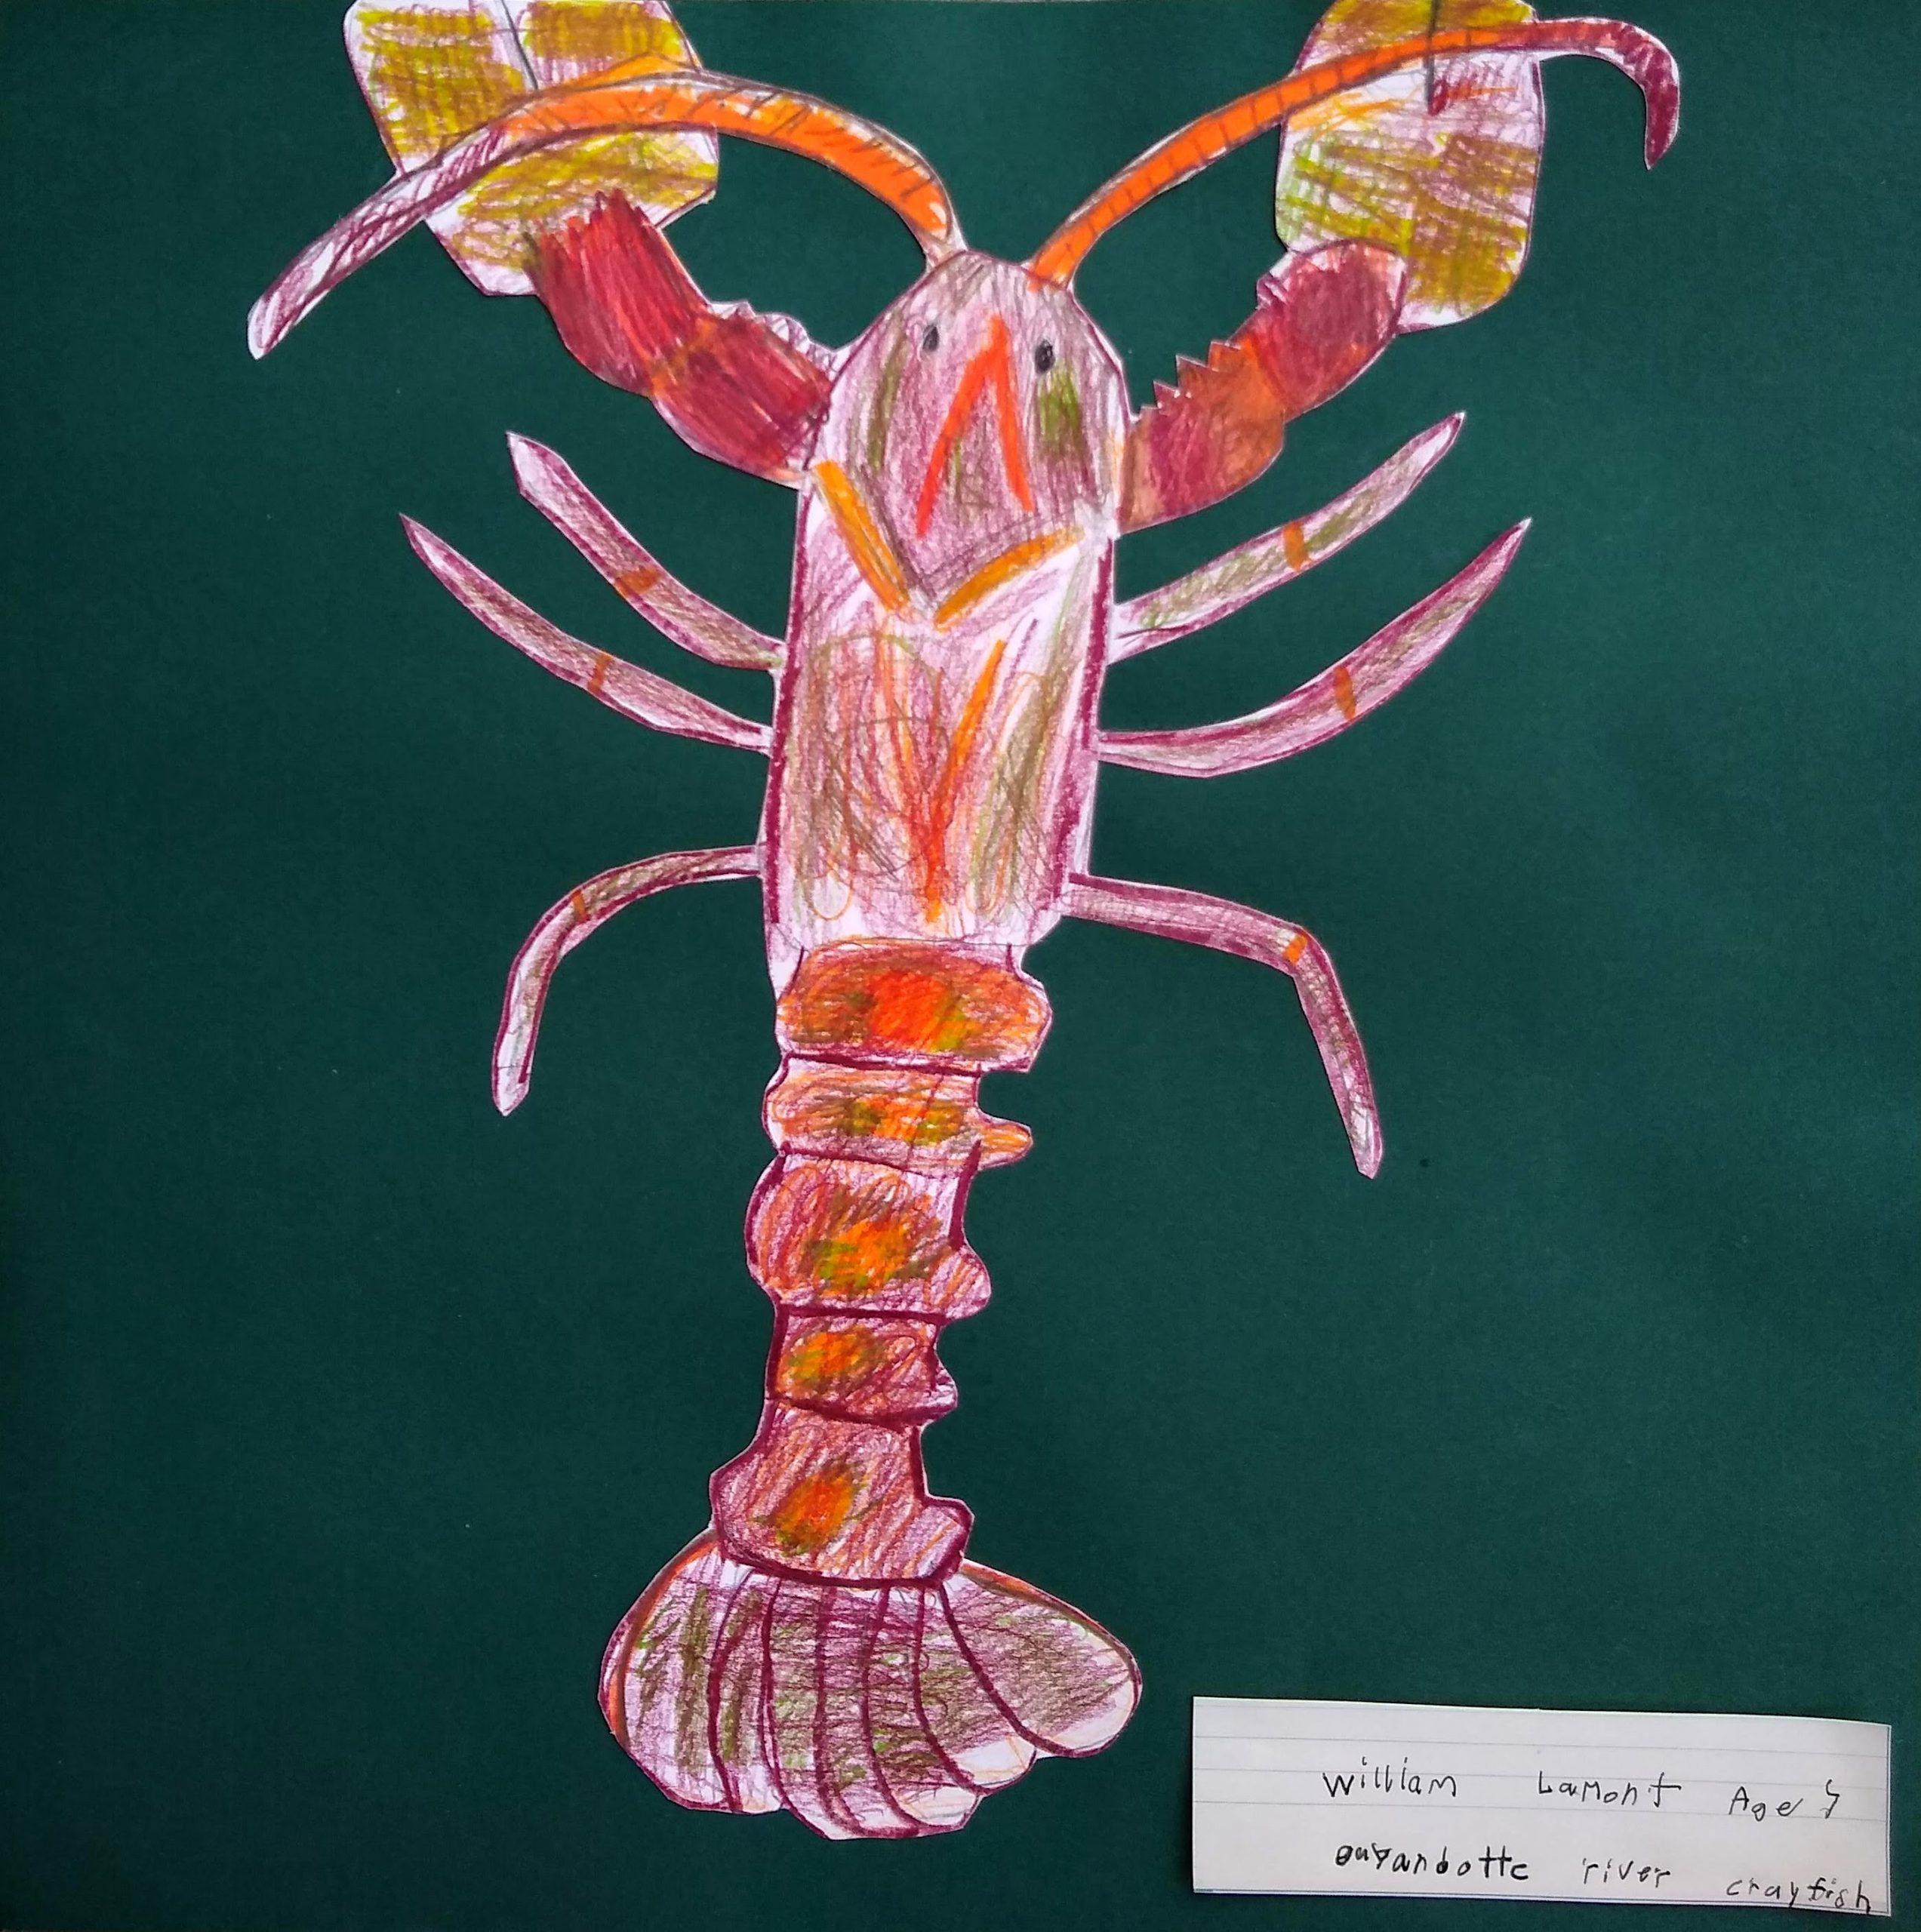 WilliamLamont_GuyandotteRiverCrayfish